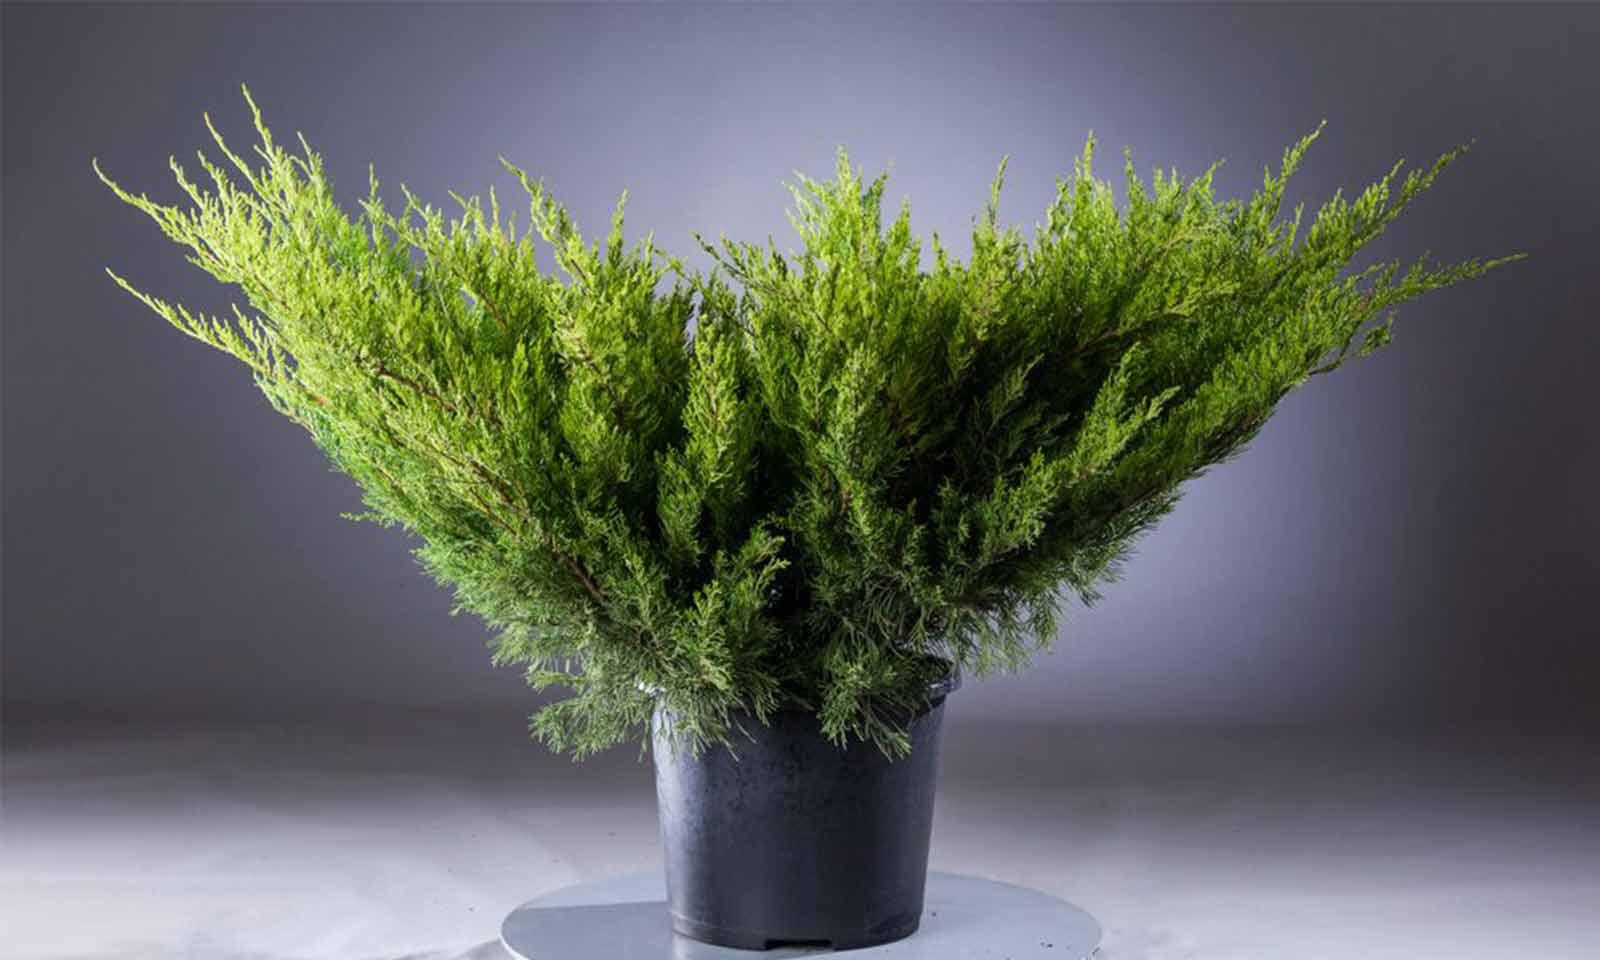 Juniperus x Media 'Mint Julep' (Juniper 'Mint Julep')